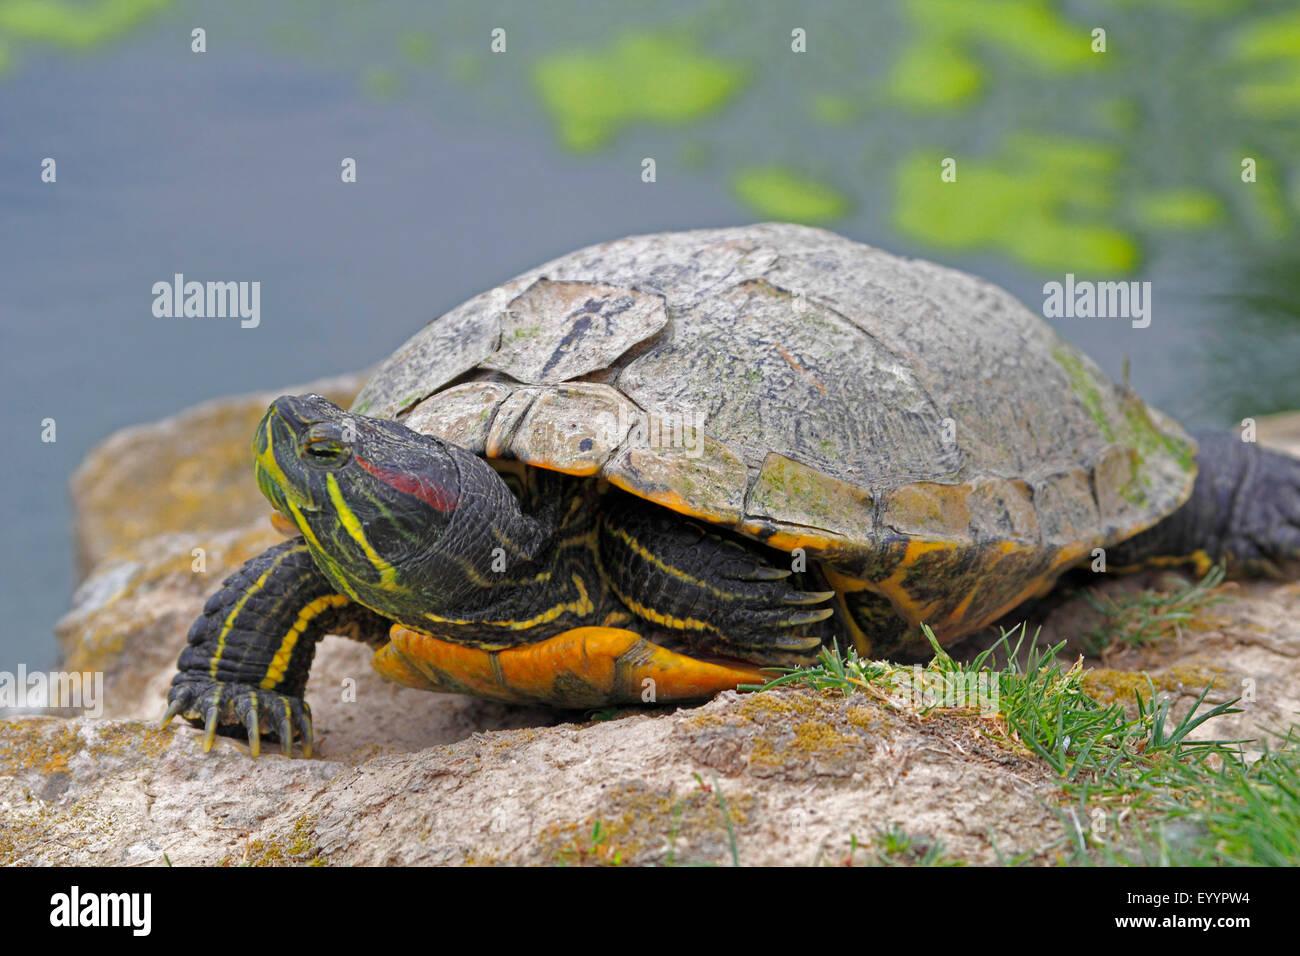 red-eared turtle, red-eared slider (Pseudemys scripta elegans, Trachemys scripta elegans, Chrysemys scripta elegans), - Stock Image